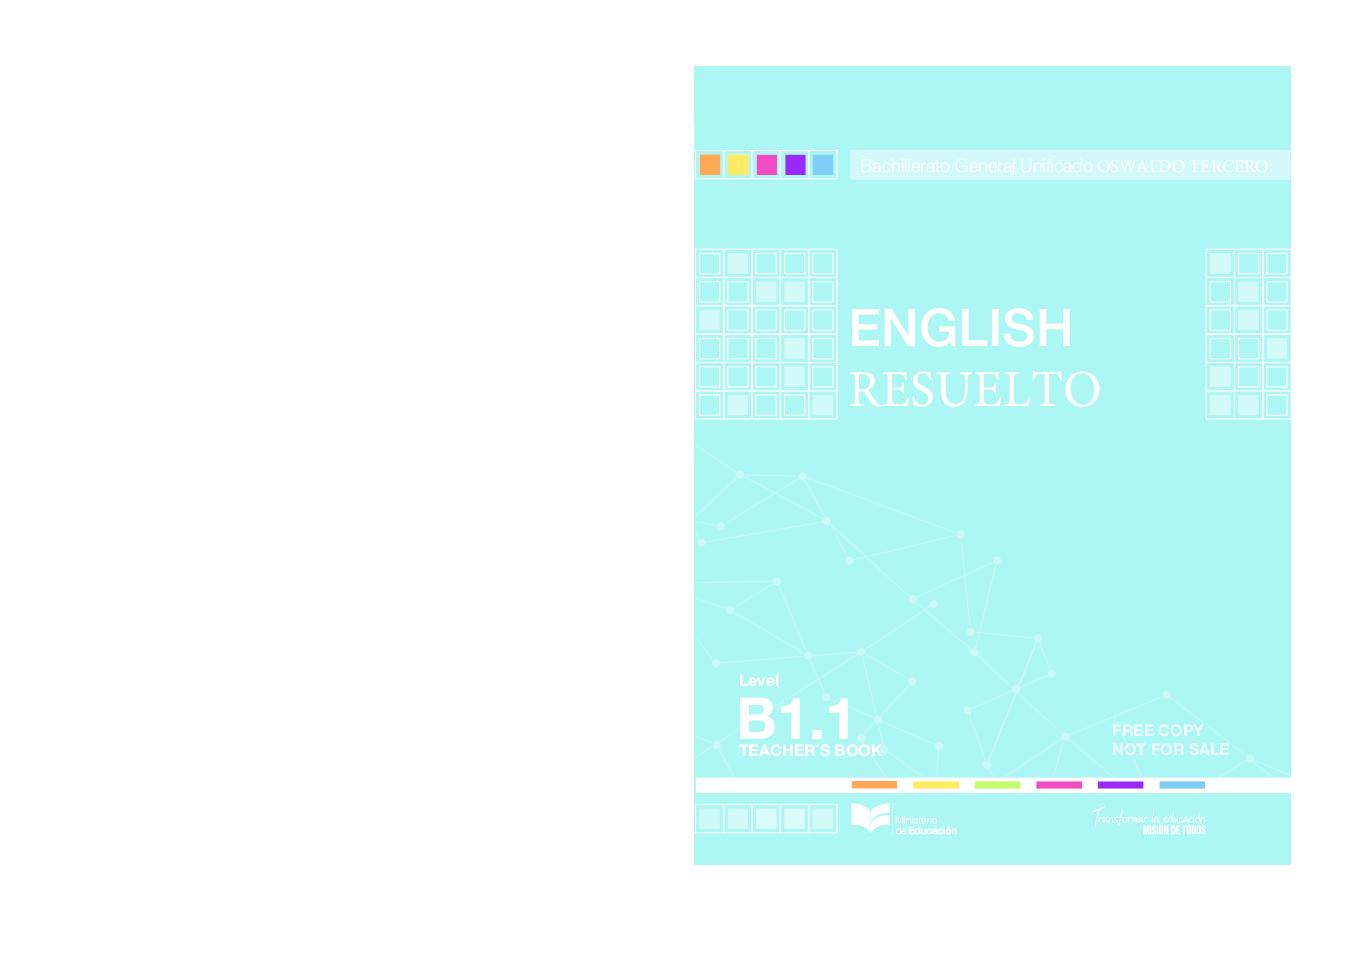 Pdf Solucionario English B1 3 De Bachillerato 1 Jean Marce Academia Edu